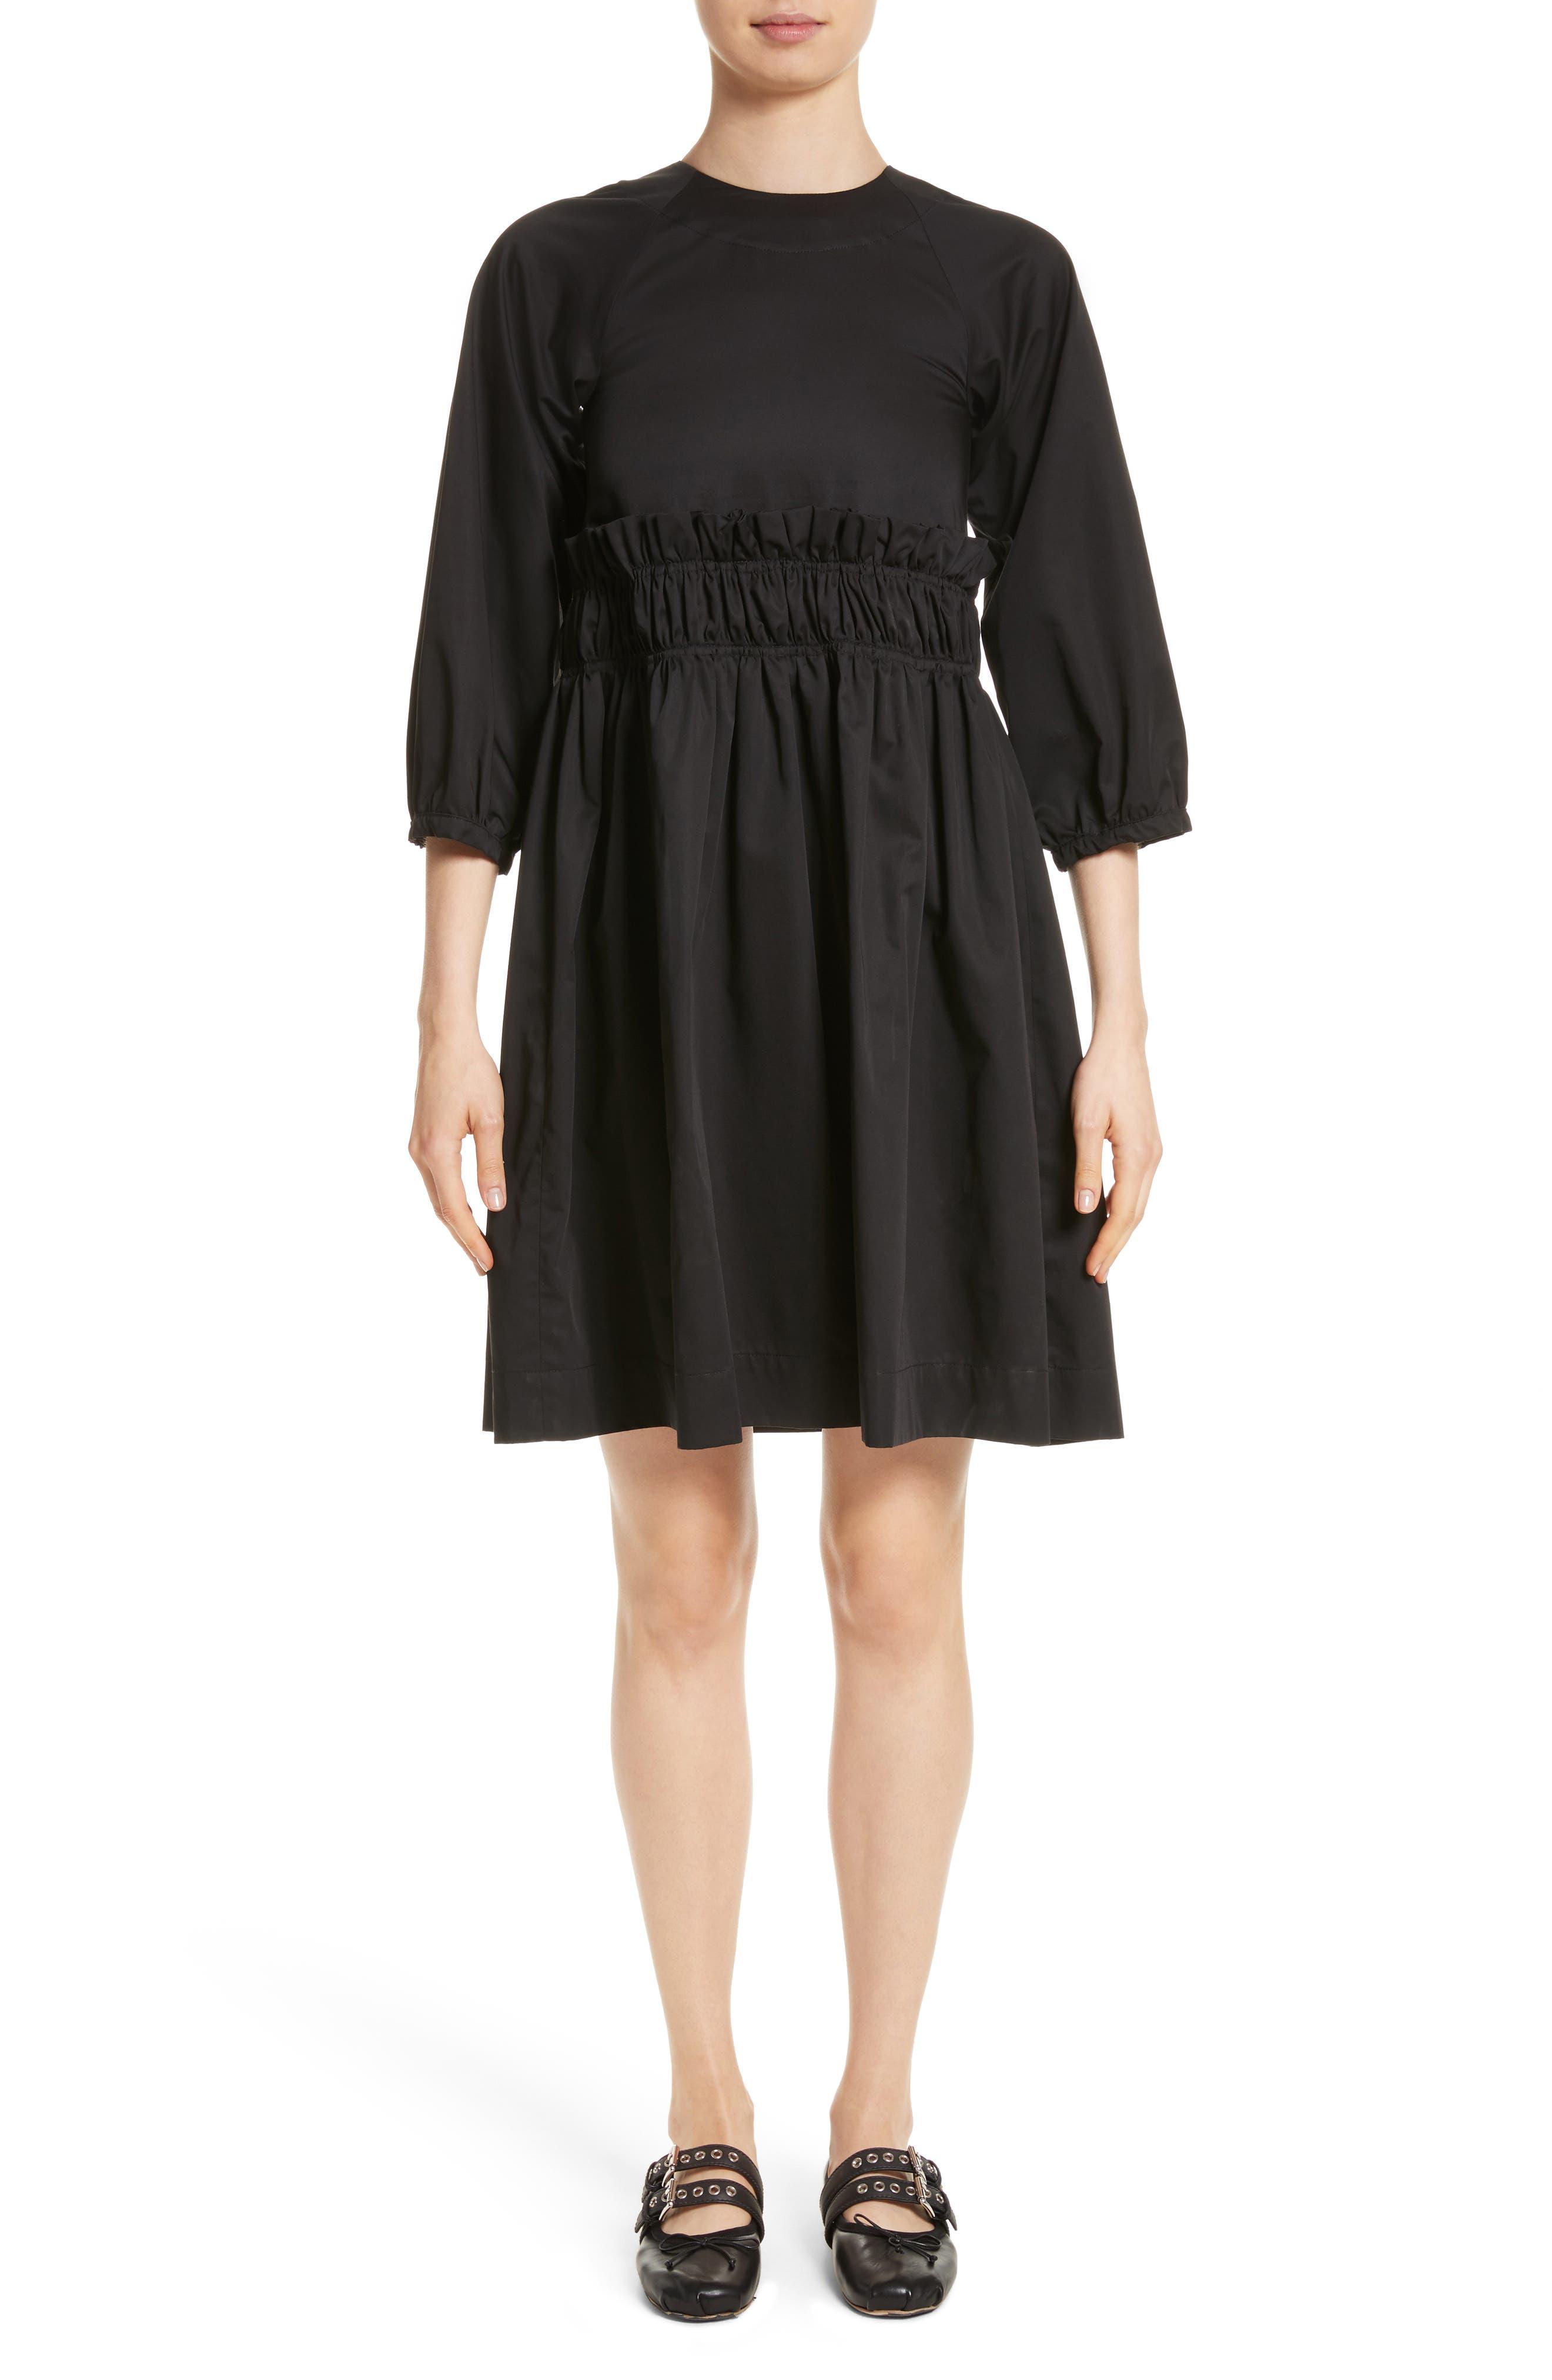 Molly Goddard Blake Dress